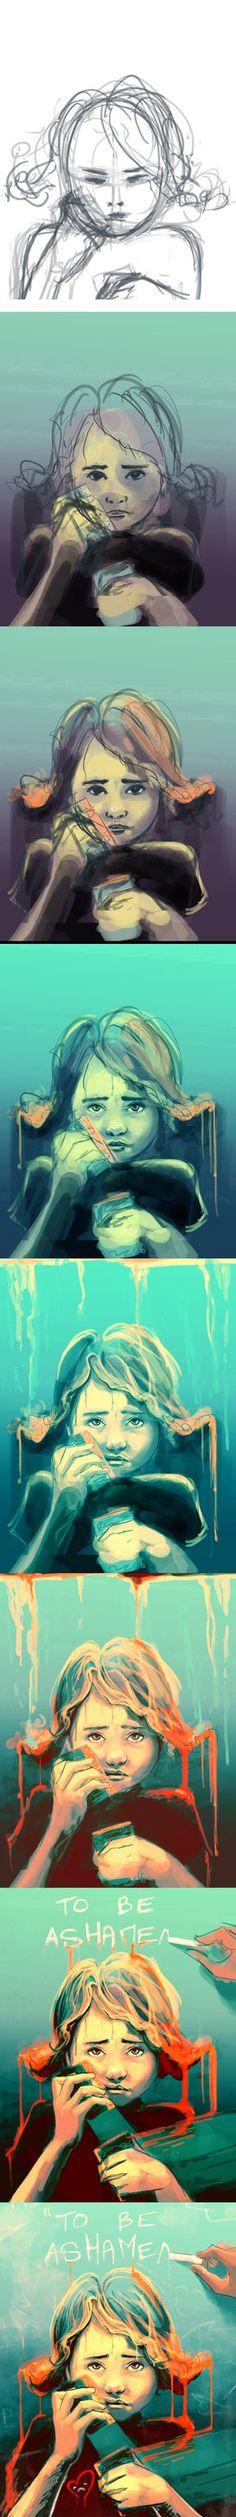 WIP I promise I won't cry by `AquaSixio on deviantART